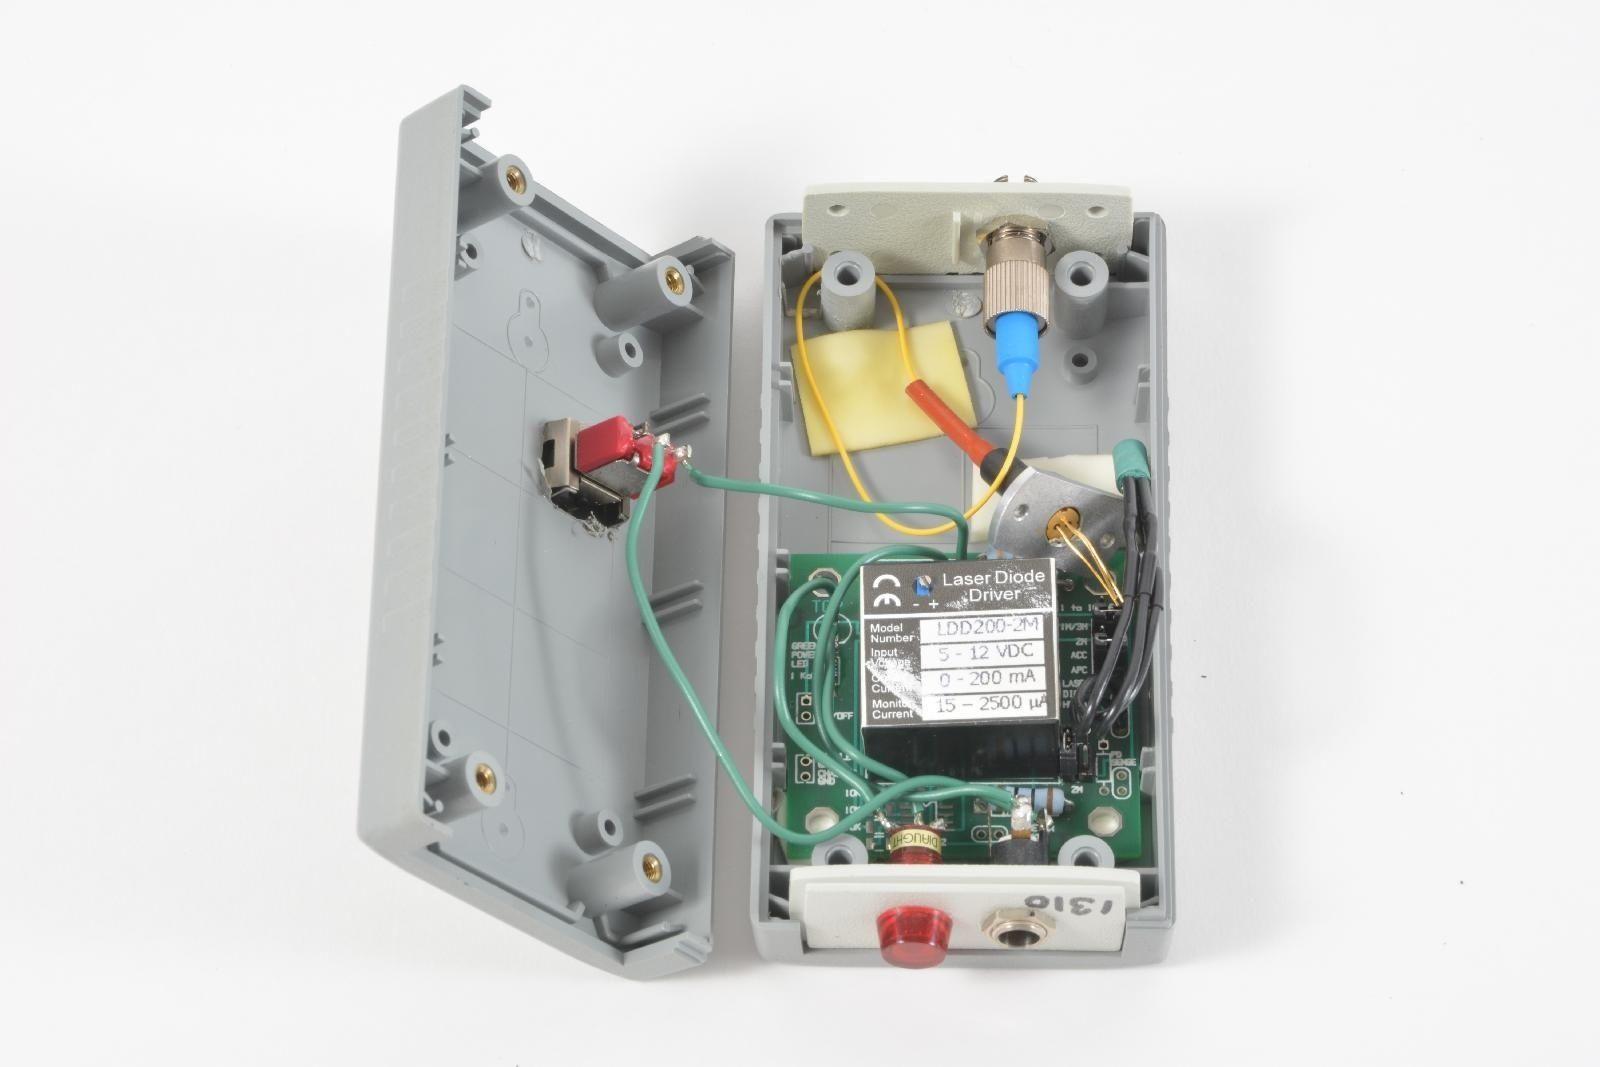 Wavelength Electronics 1310nm Source Ldd200 2m Diode Laser Driver Circuit Lot Of 8